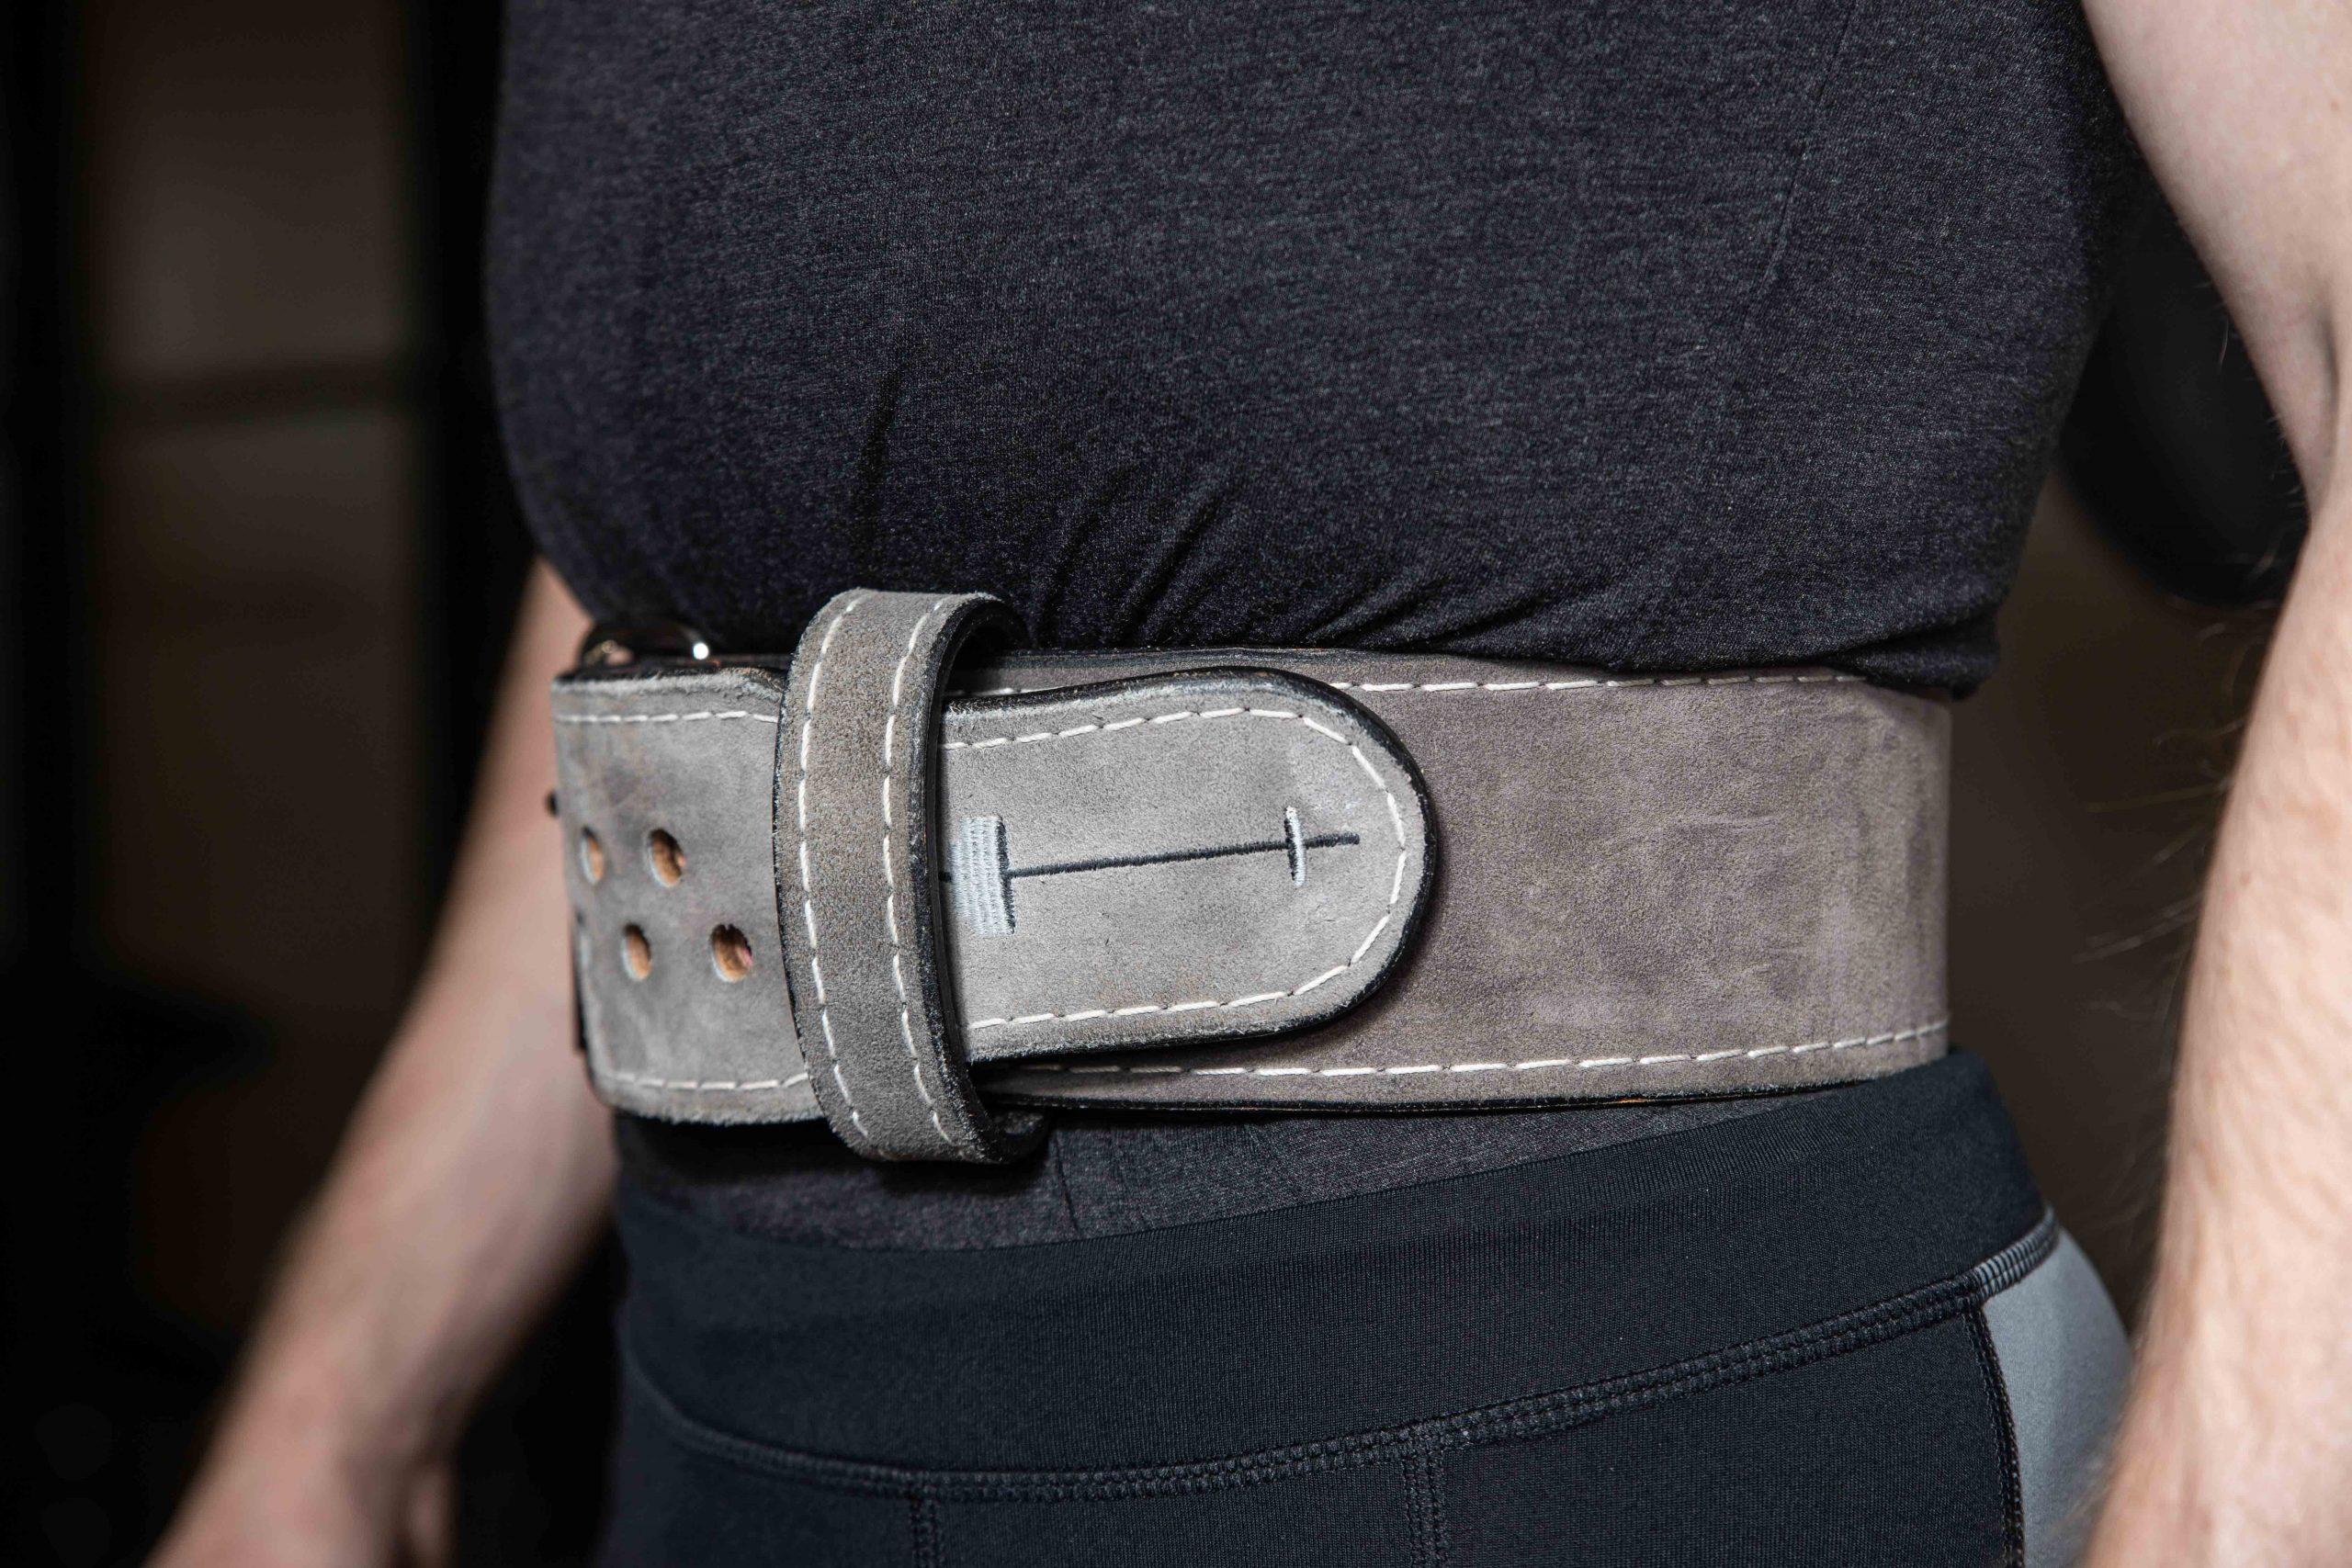 Robert Ordway Pioneer belt close-up